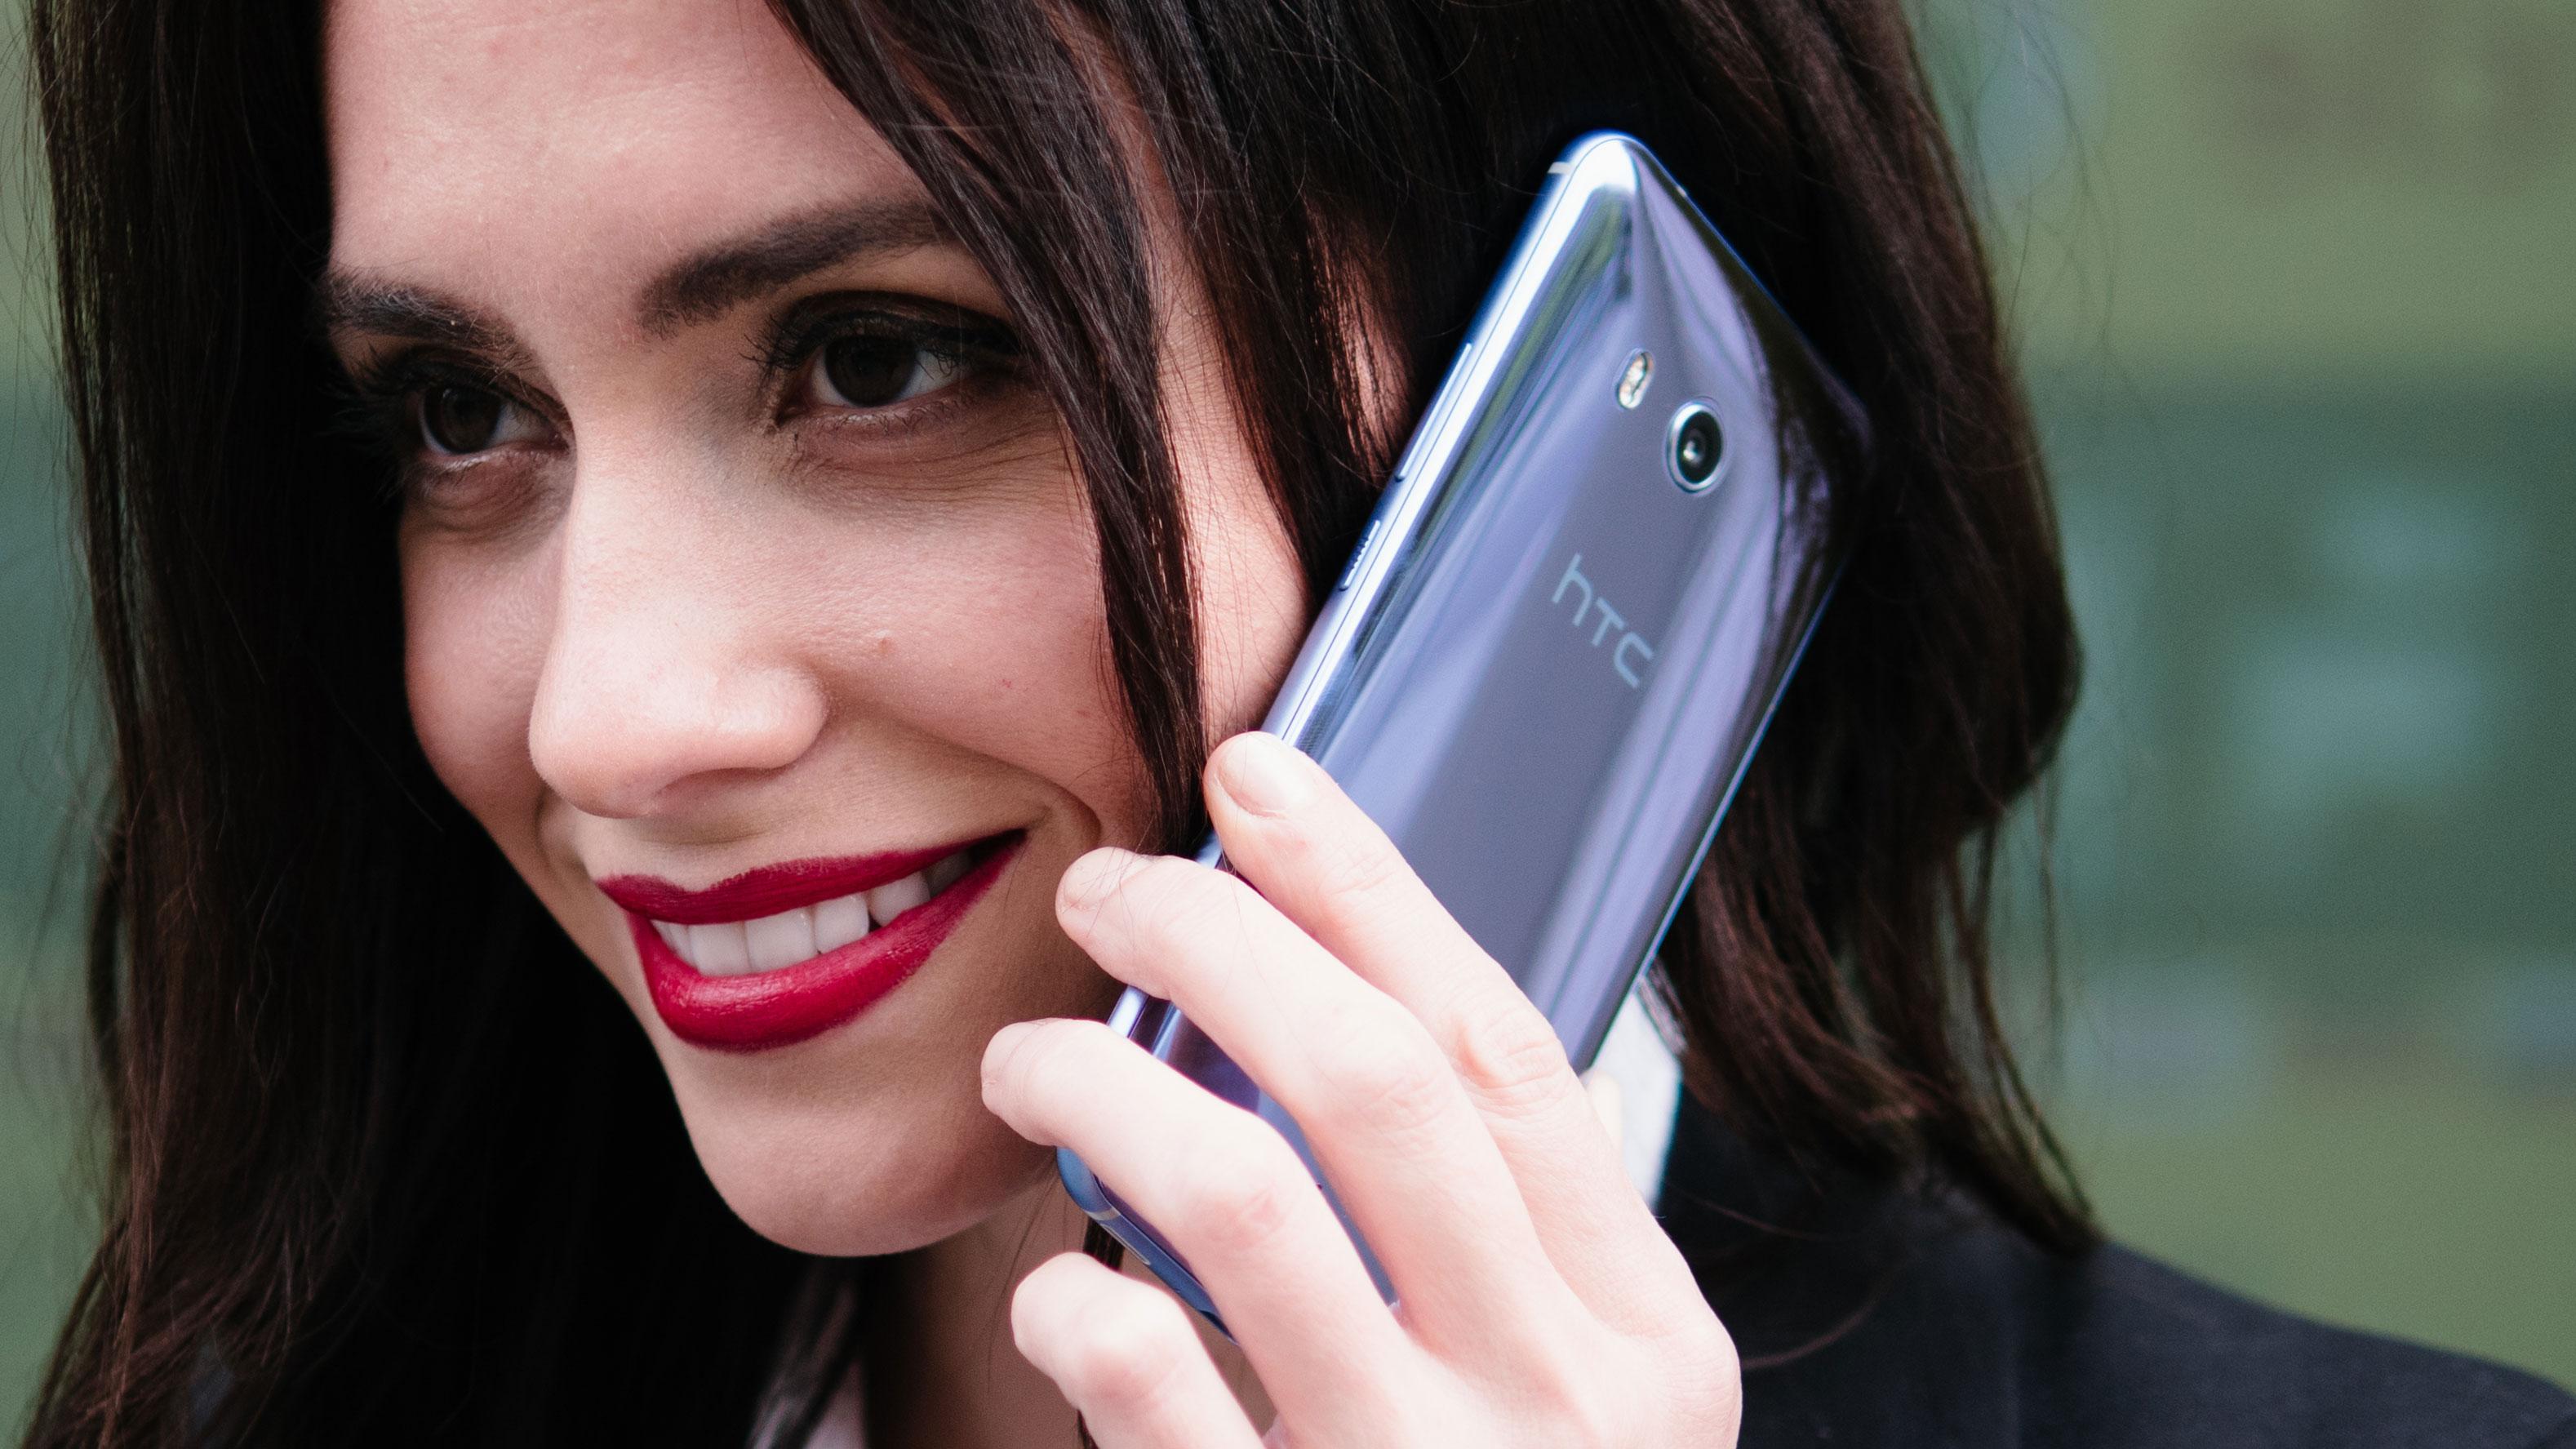 HTC U11 camera will get improved video recording very soon